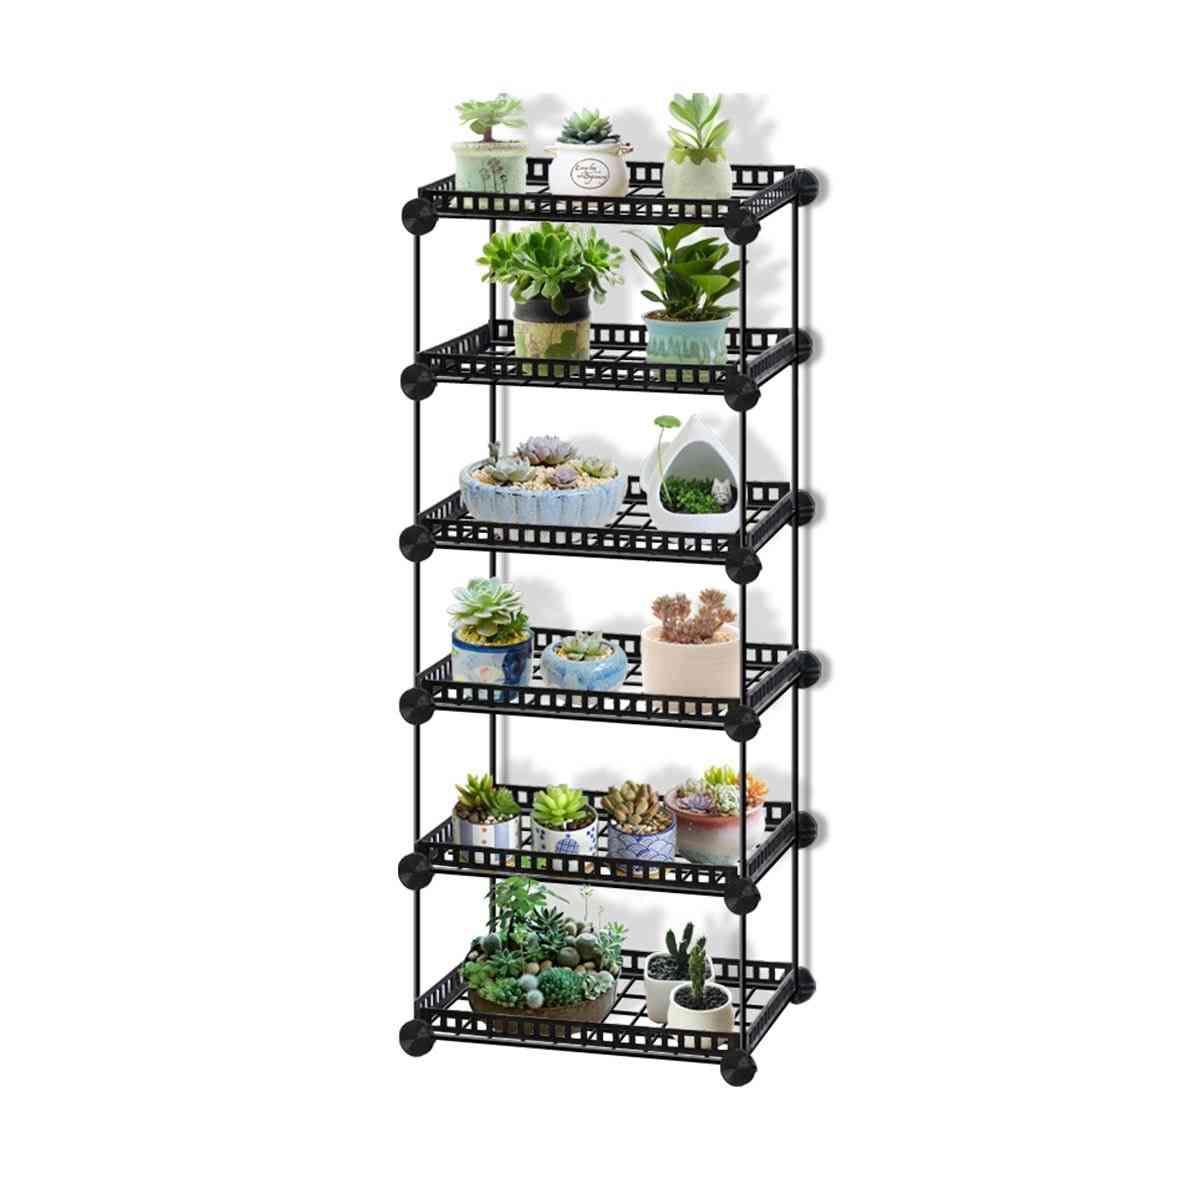 Durable Metal Plant Shelves Flower Pot Holder Garden Rack Display Stand Succulent Plants